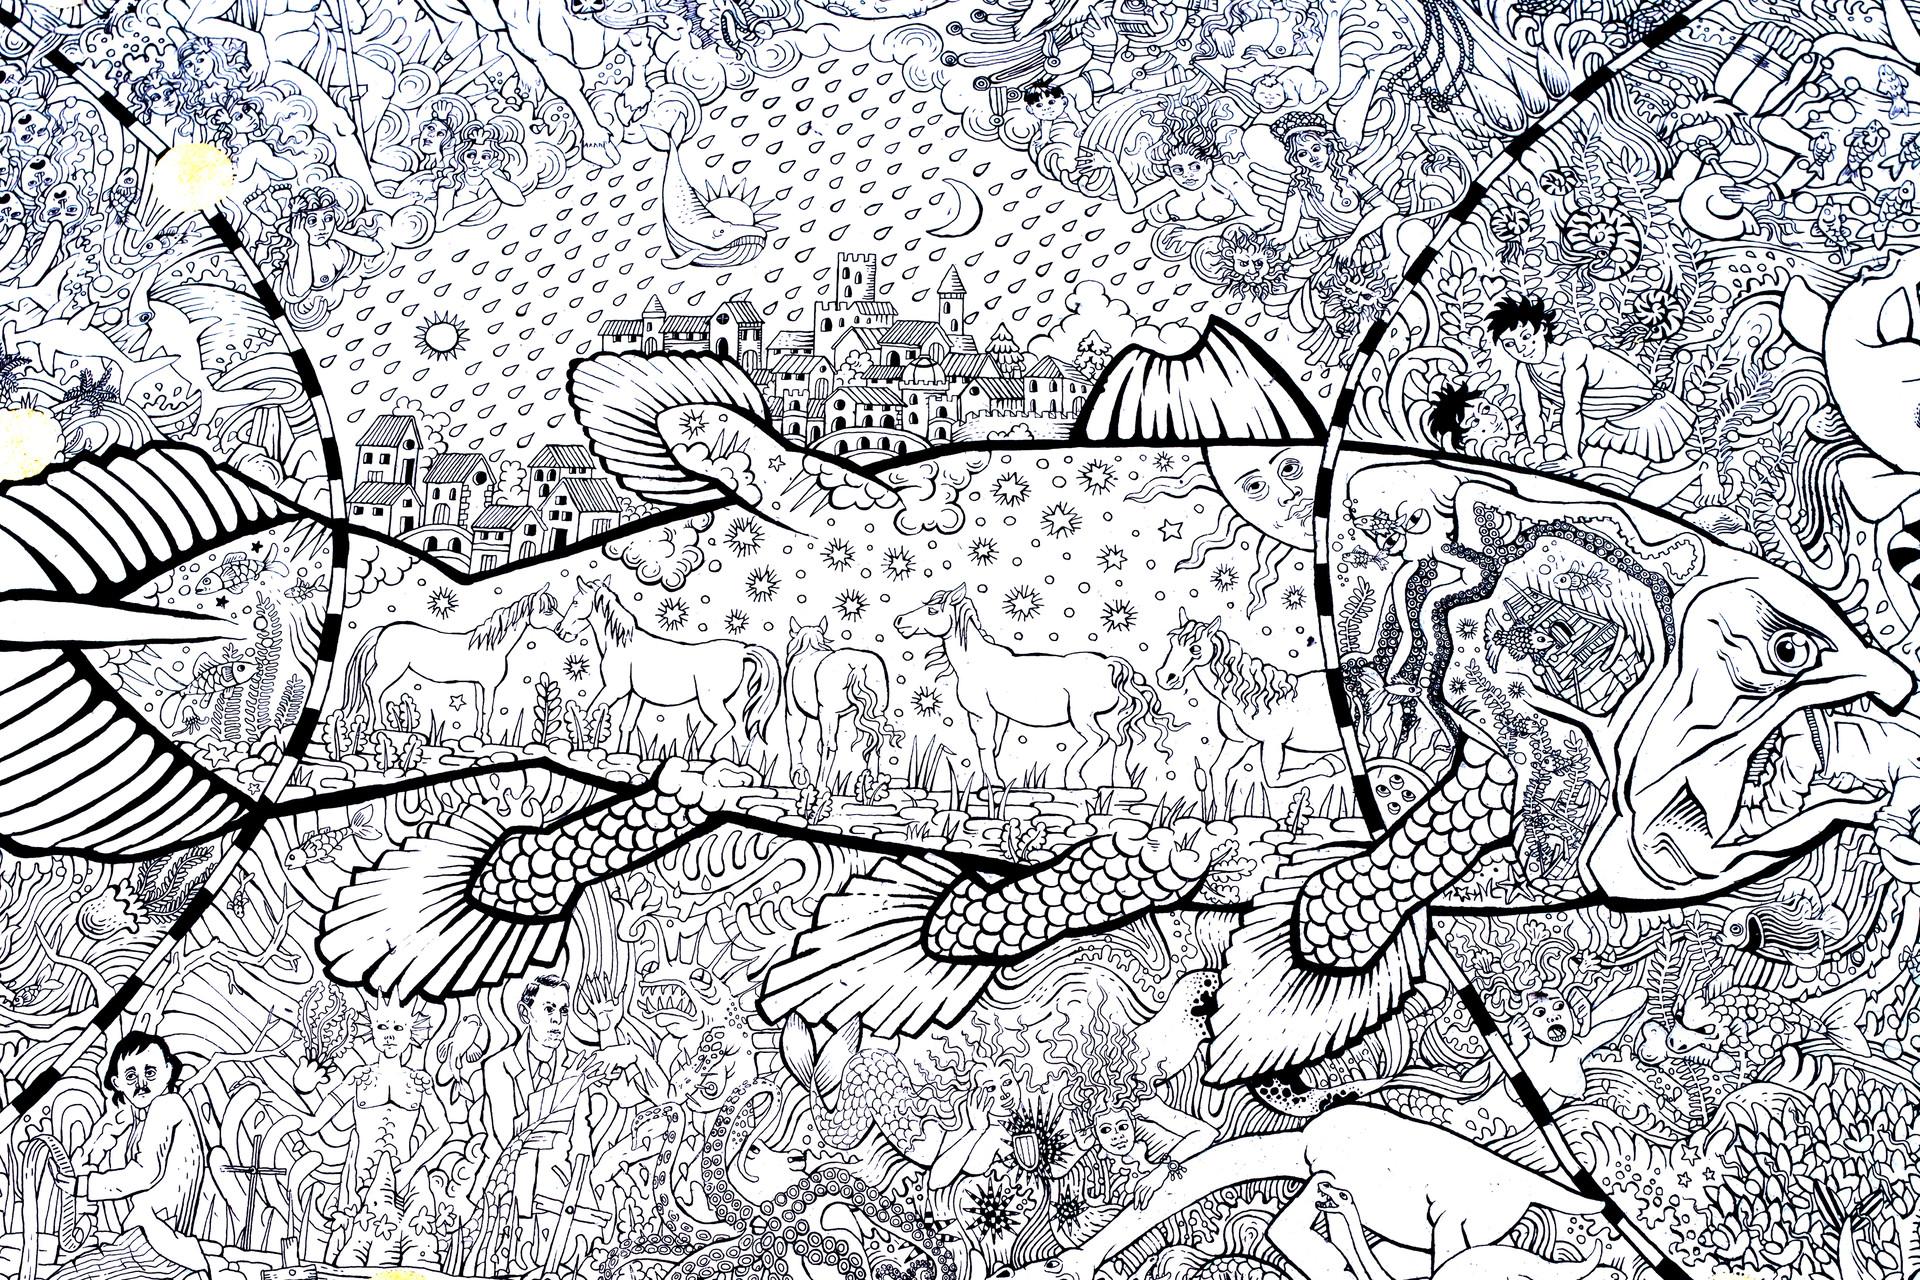 Agathe pitie coelacanthe detail 01 copie